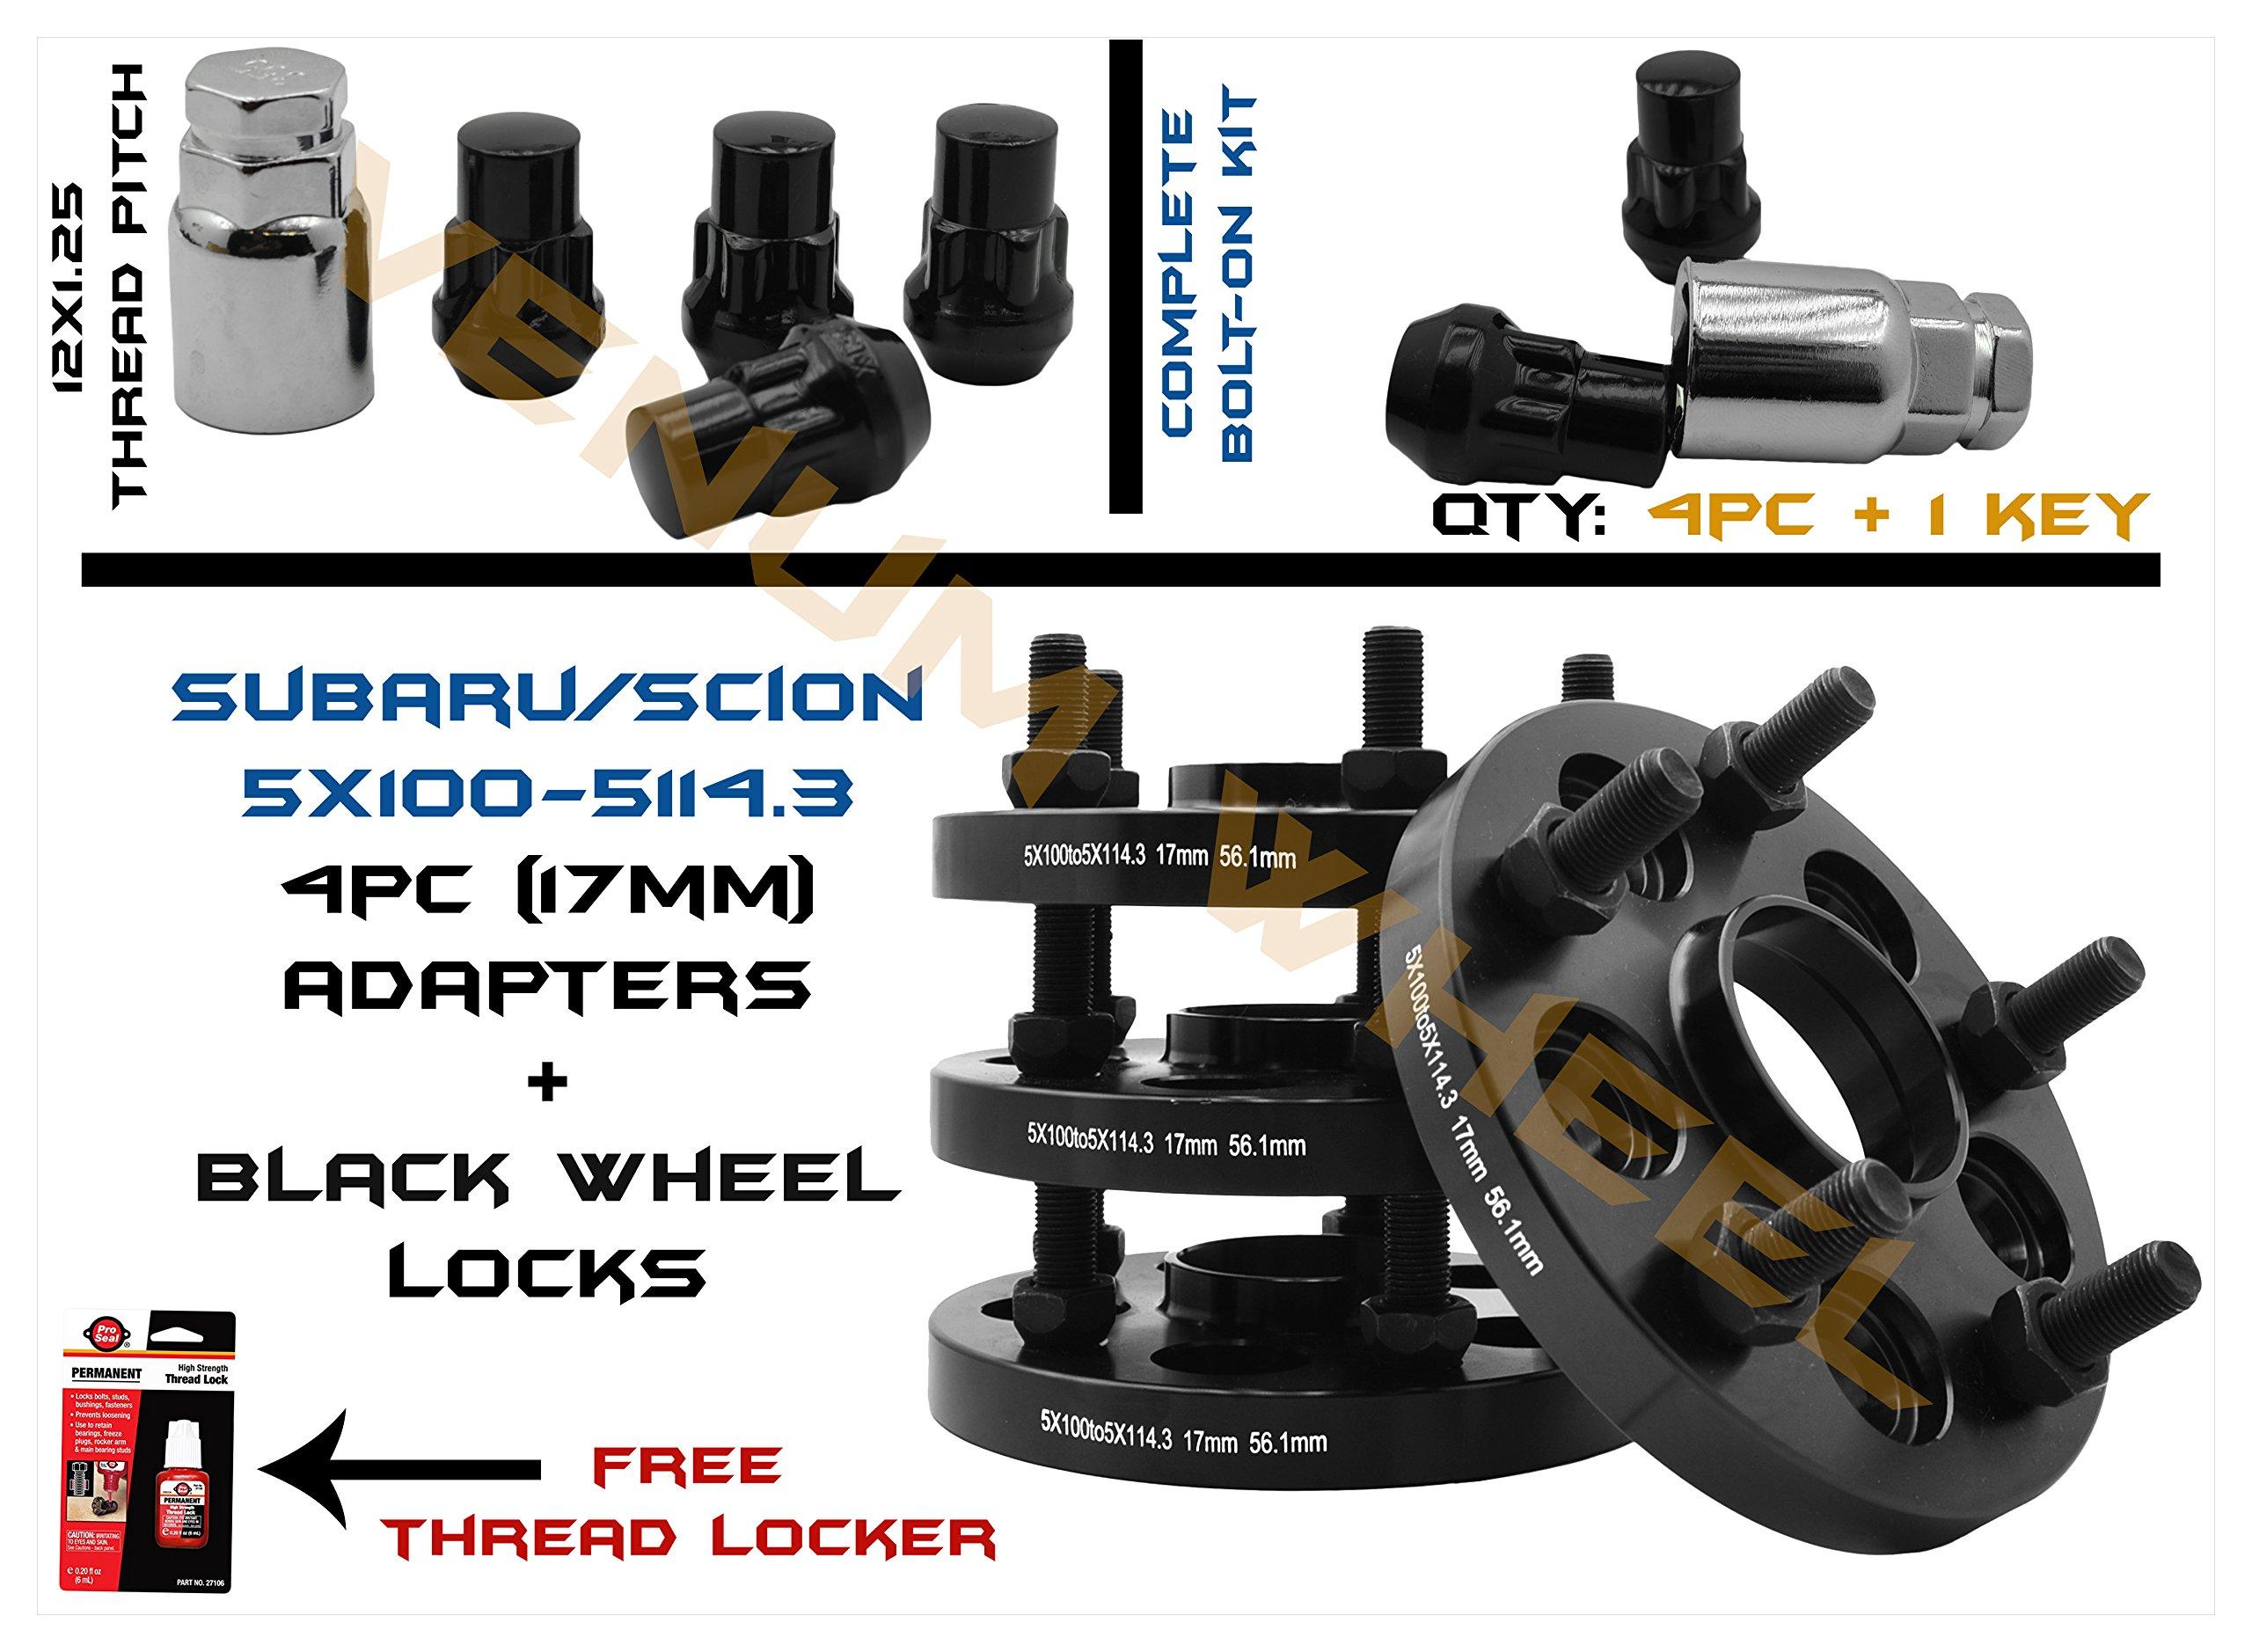 4pc 5x100 to 5x114.3 17mm Subaru Conversion Adapter 56.1mm Hub Centric | Includes 4 Black Wheel Locks & 1 Key